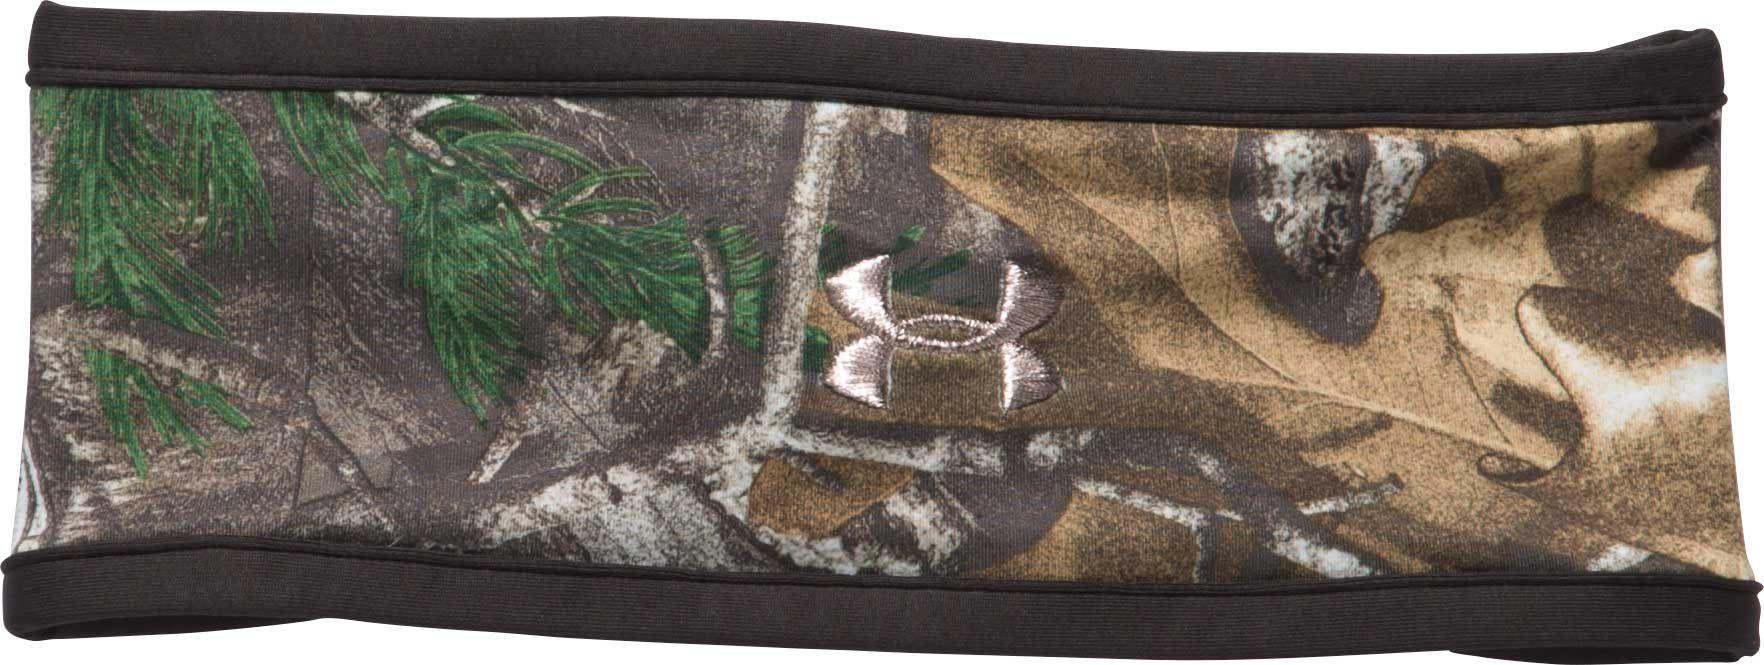 Under Armour Women's ColdGear Infrared Fleece Camo Headband, Brown